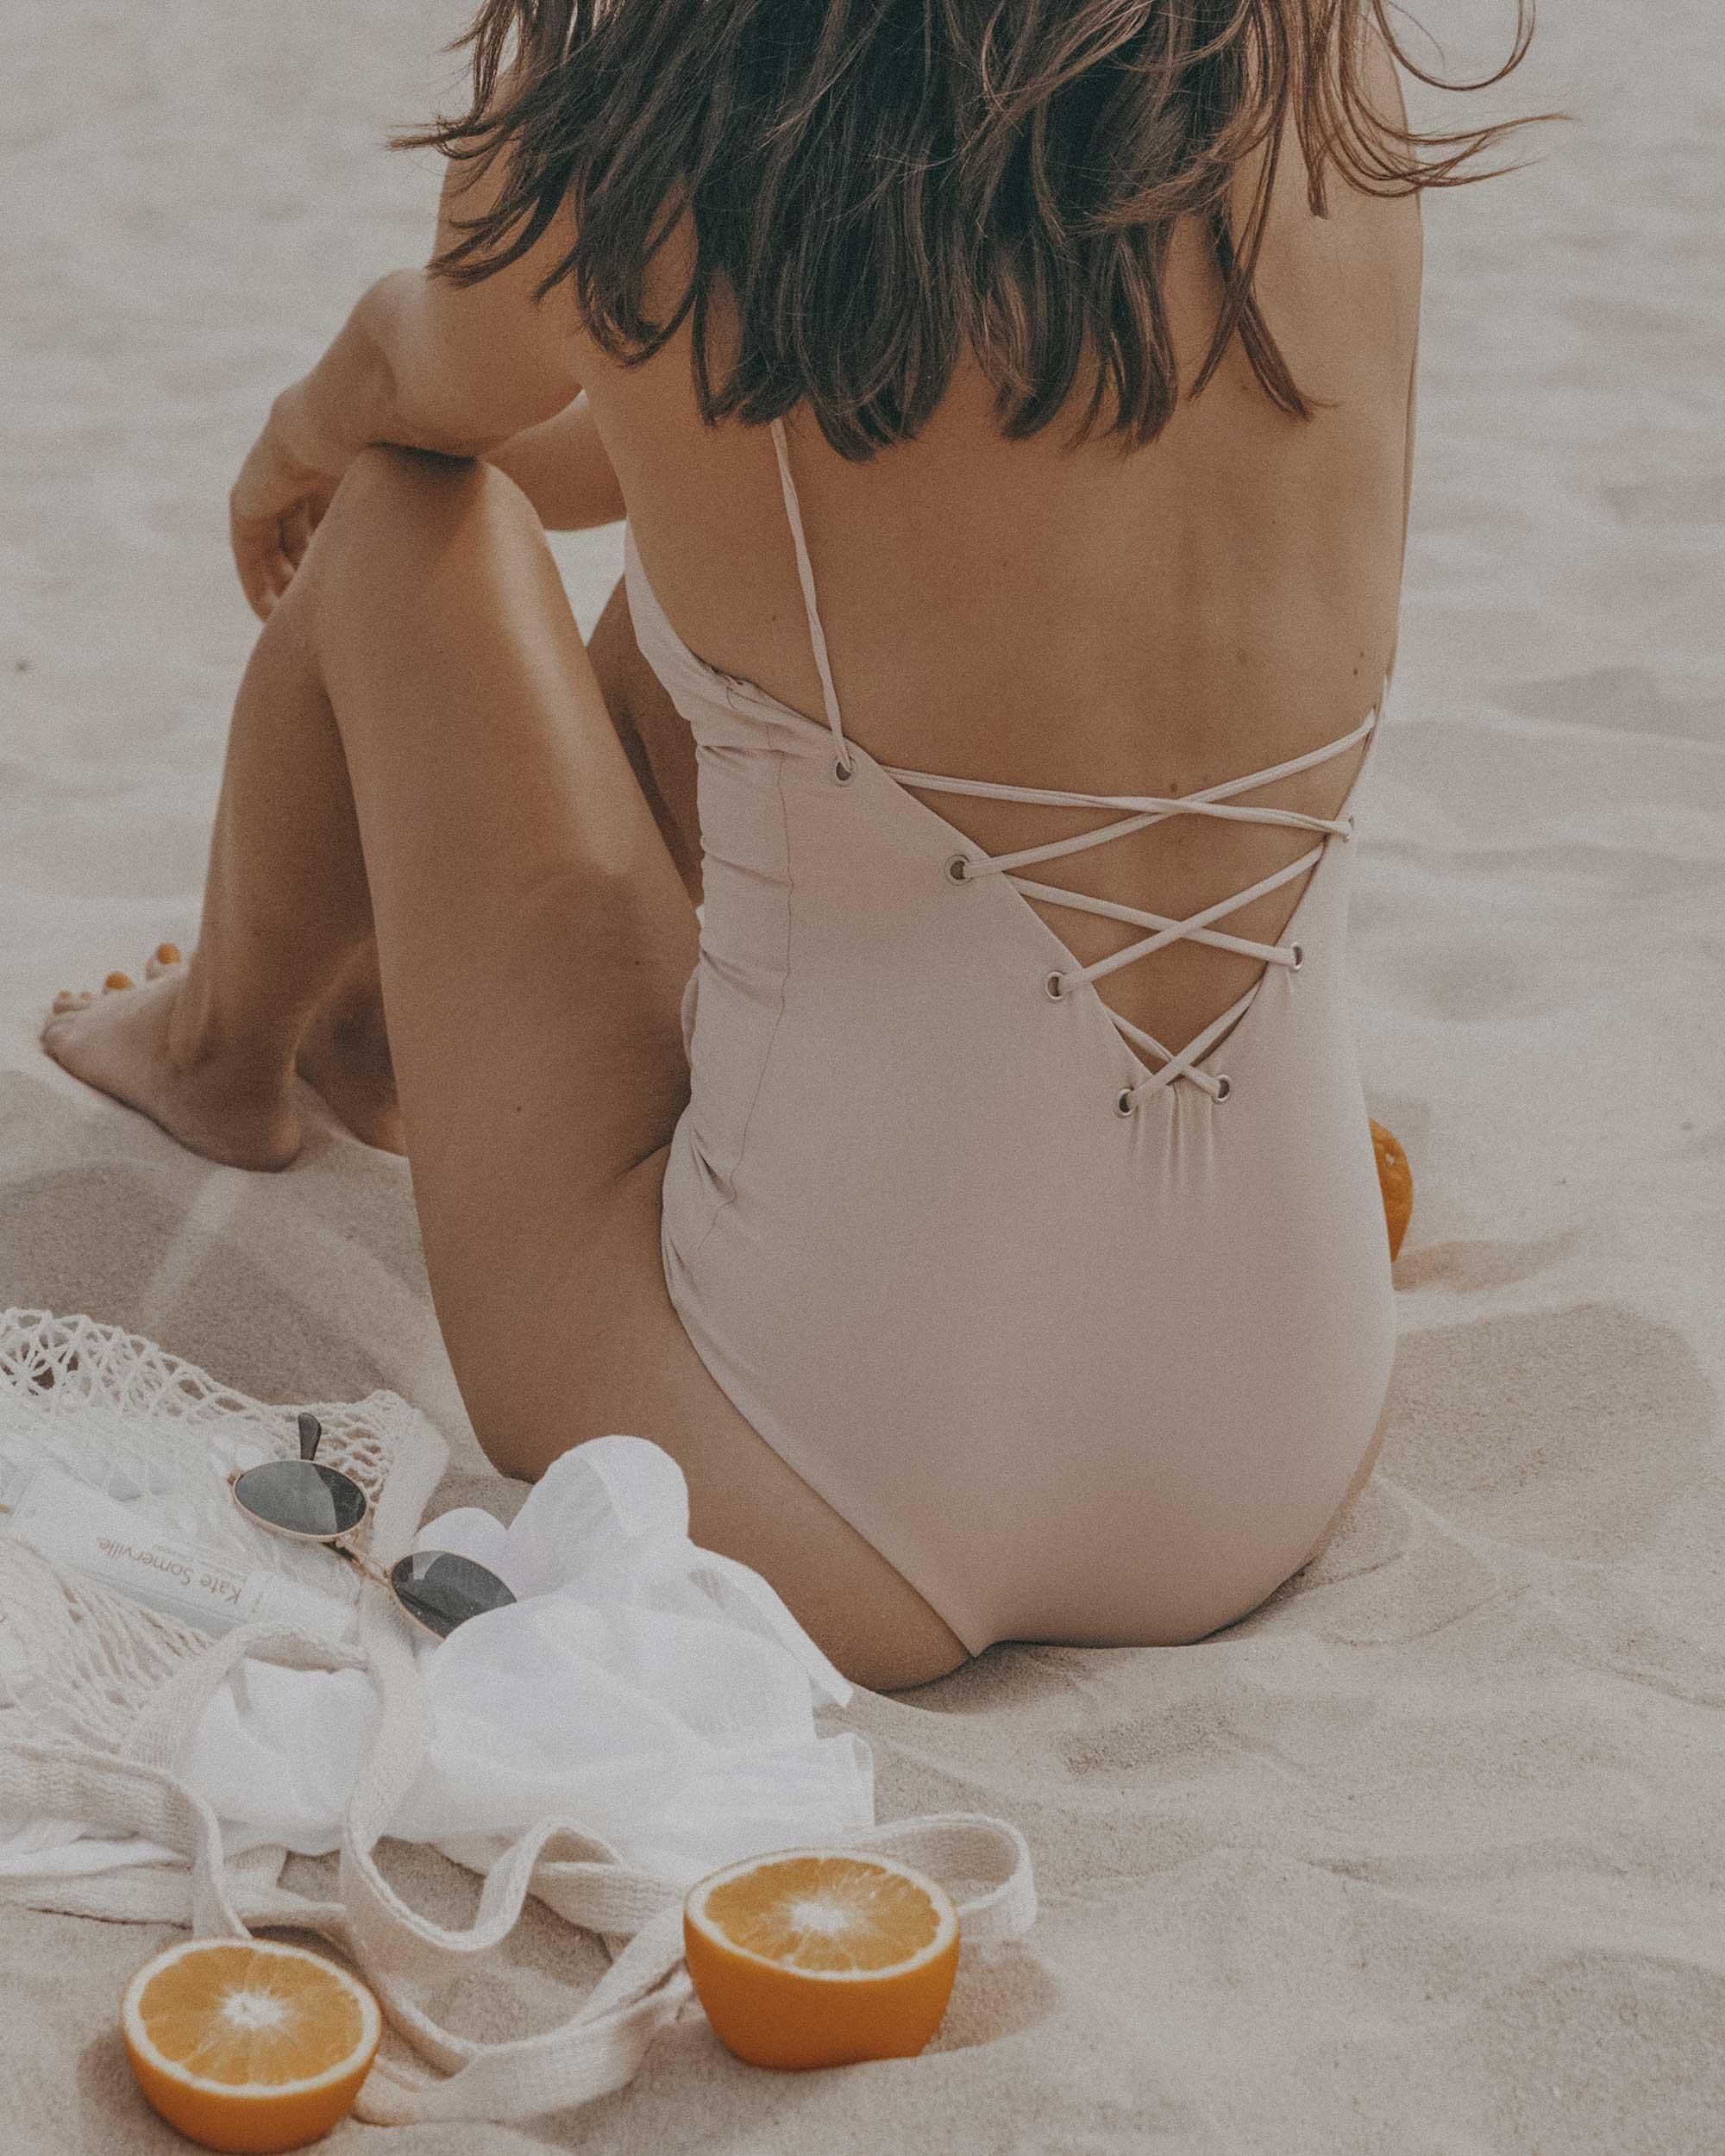 Tavik-swimwear-lace-up-front-one-piece-swimsuit-newport-beach-california-7.jpg